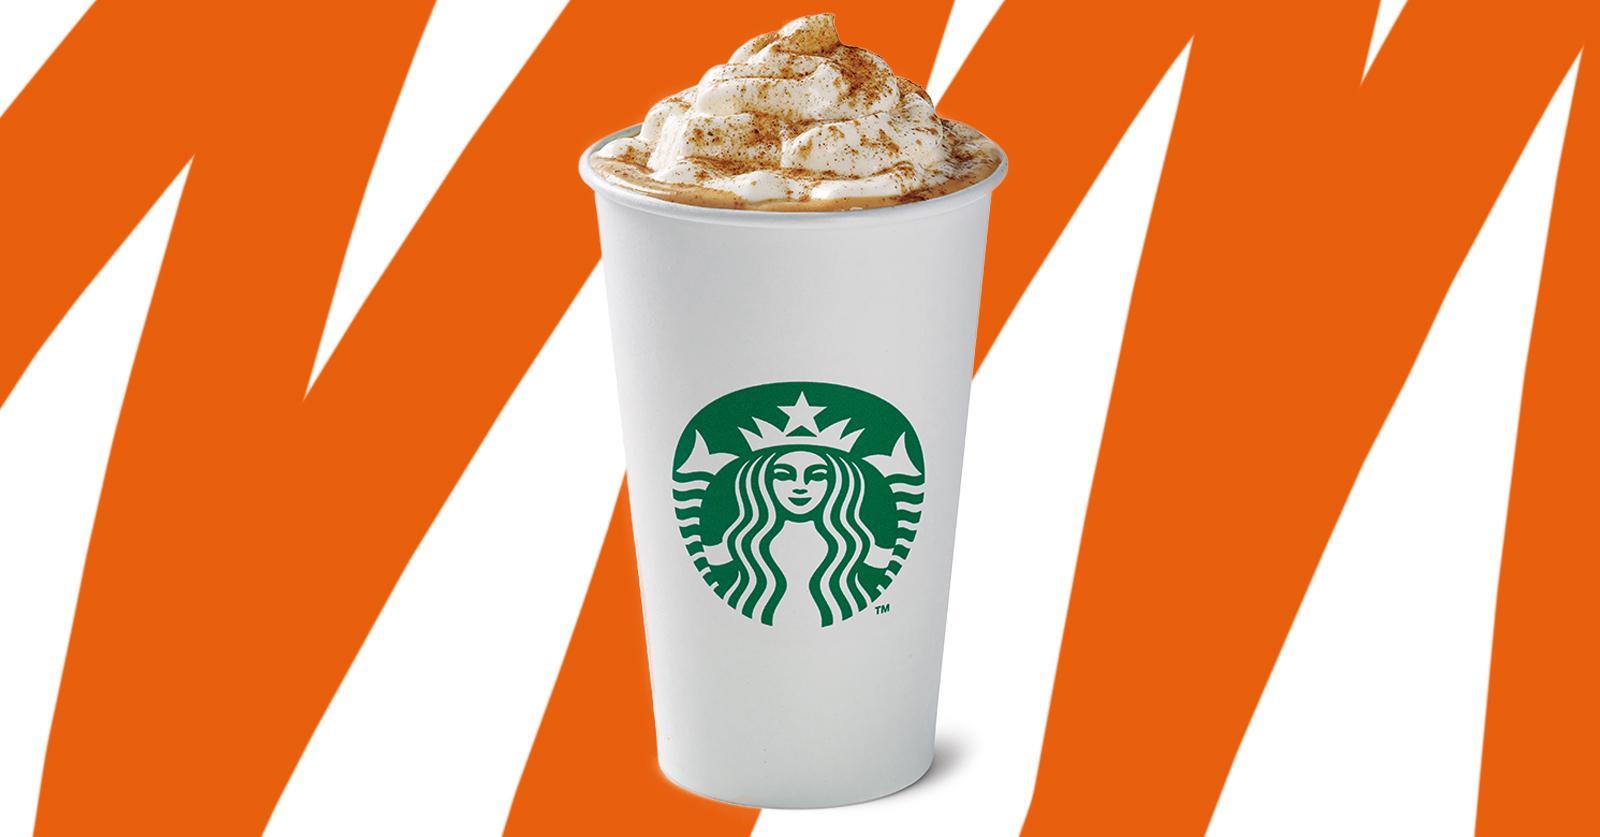 Vegan Options At Starbucks Canada - change comin